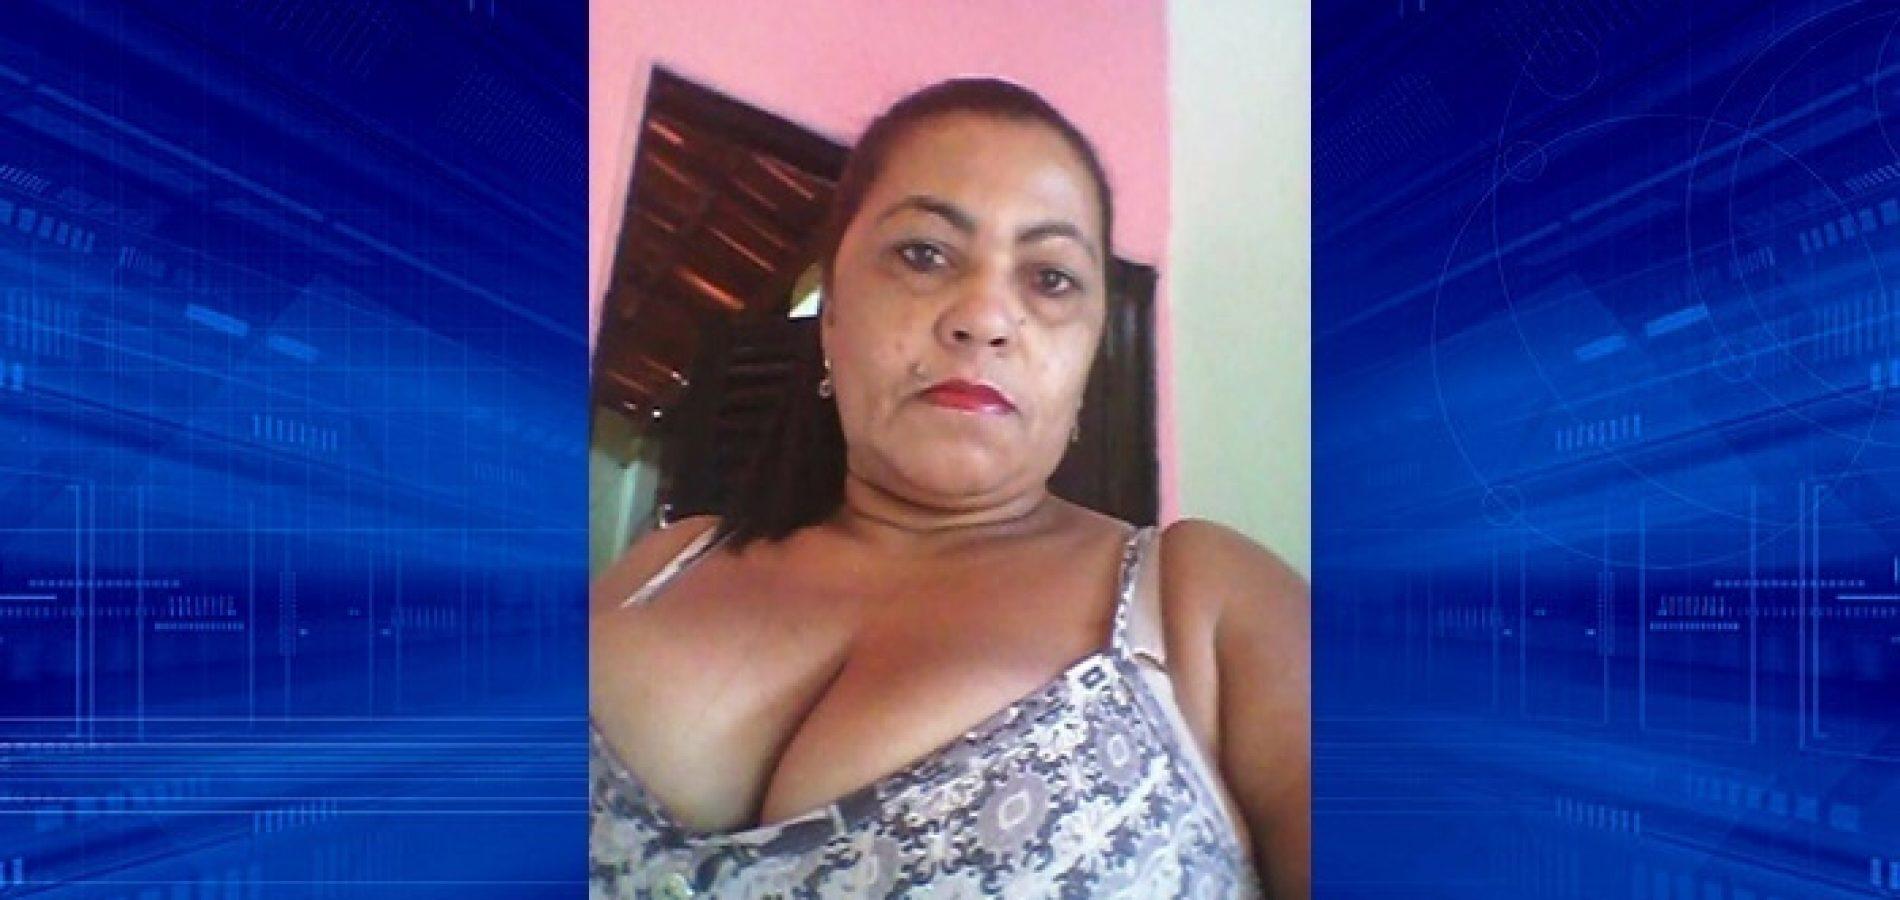 Comerciante é encontrada amarrada e morta dentro de casa interior do do Piauí